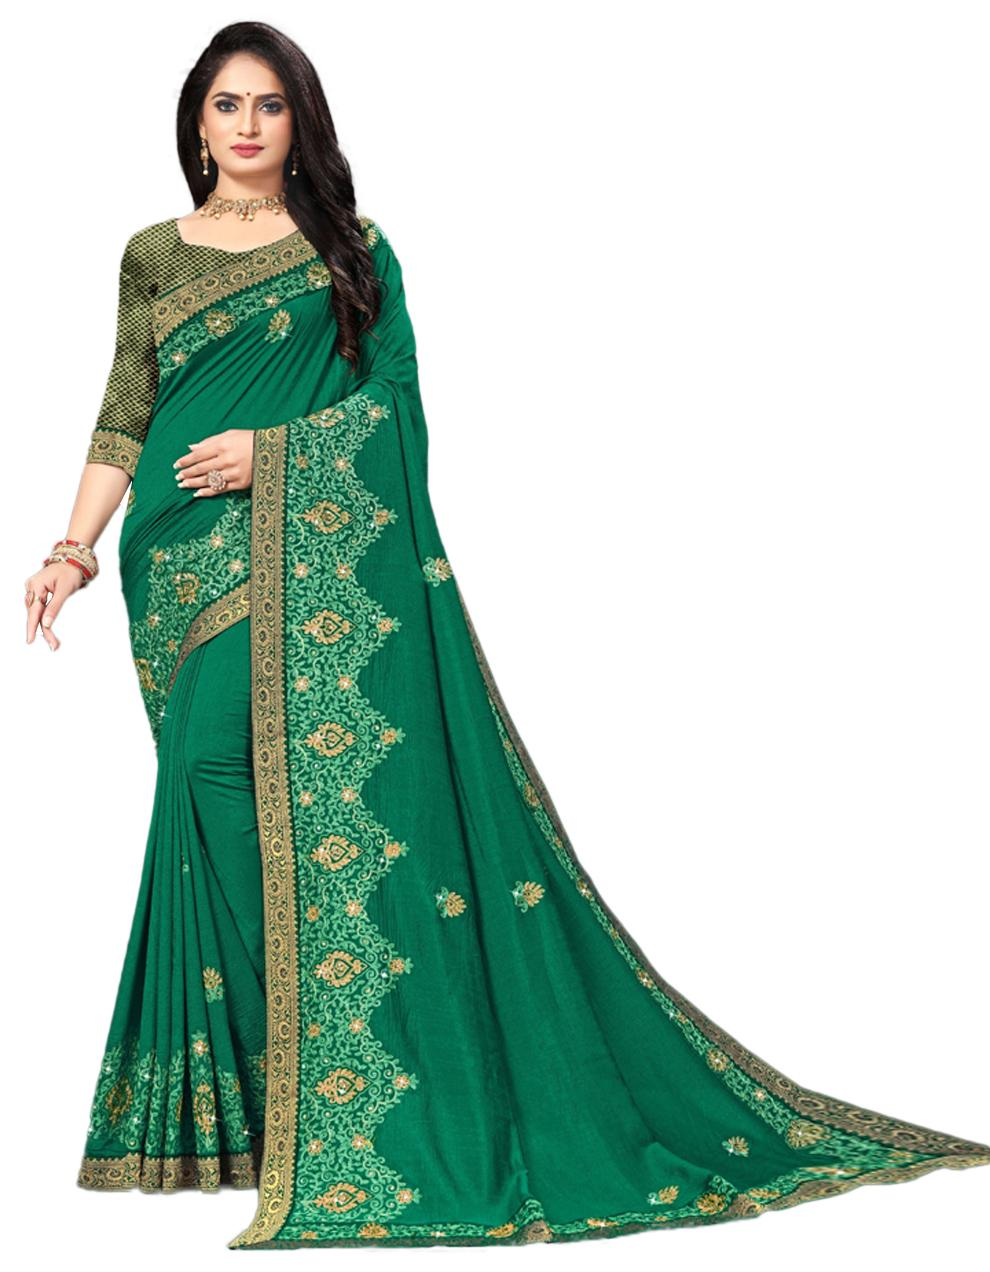 Green Vichitra silk Saree With Blouse IW24388